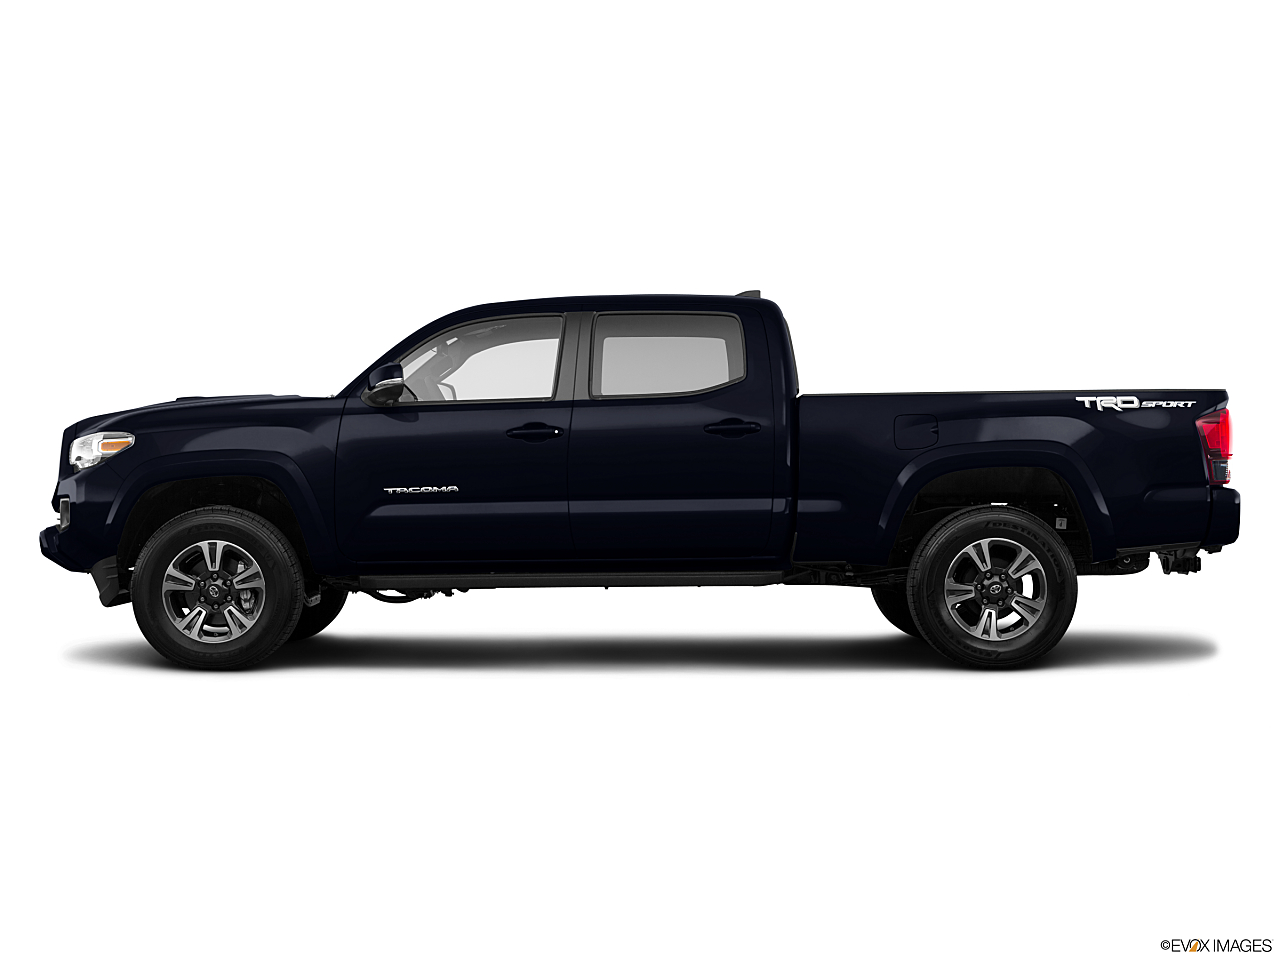 2018 Toyota Tacoma At Capitol Of San Jose Ca The Dealership Has Not